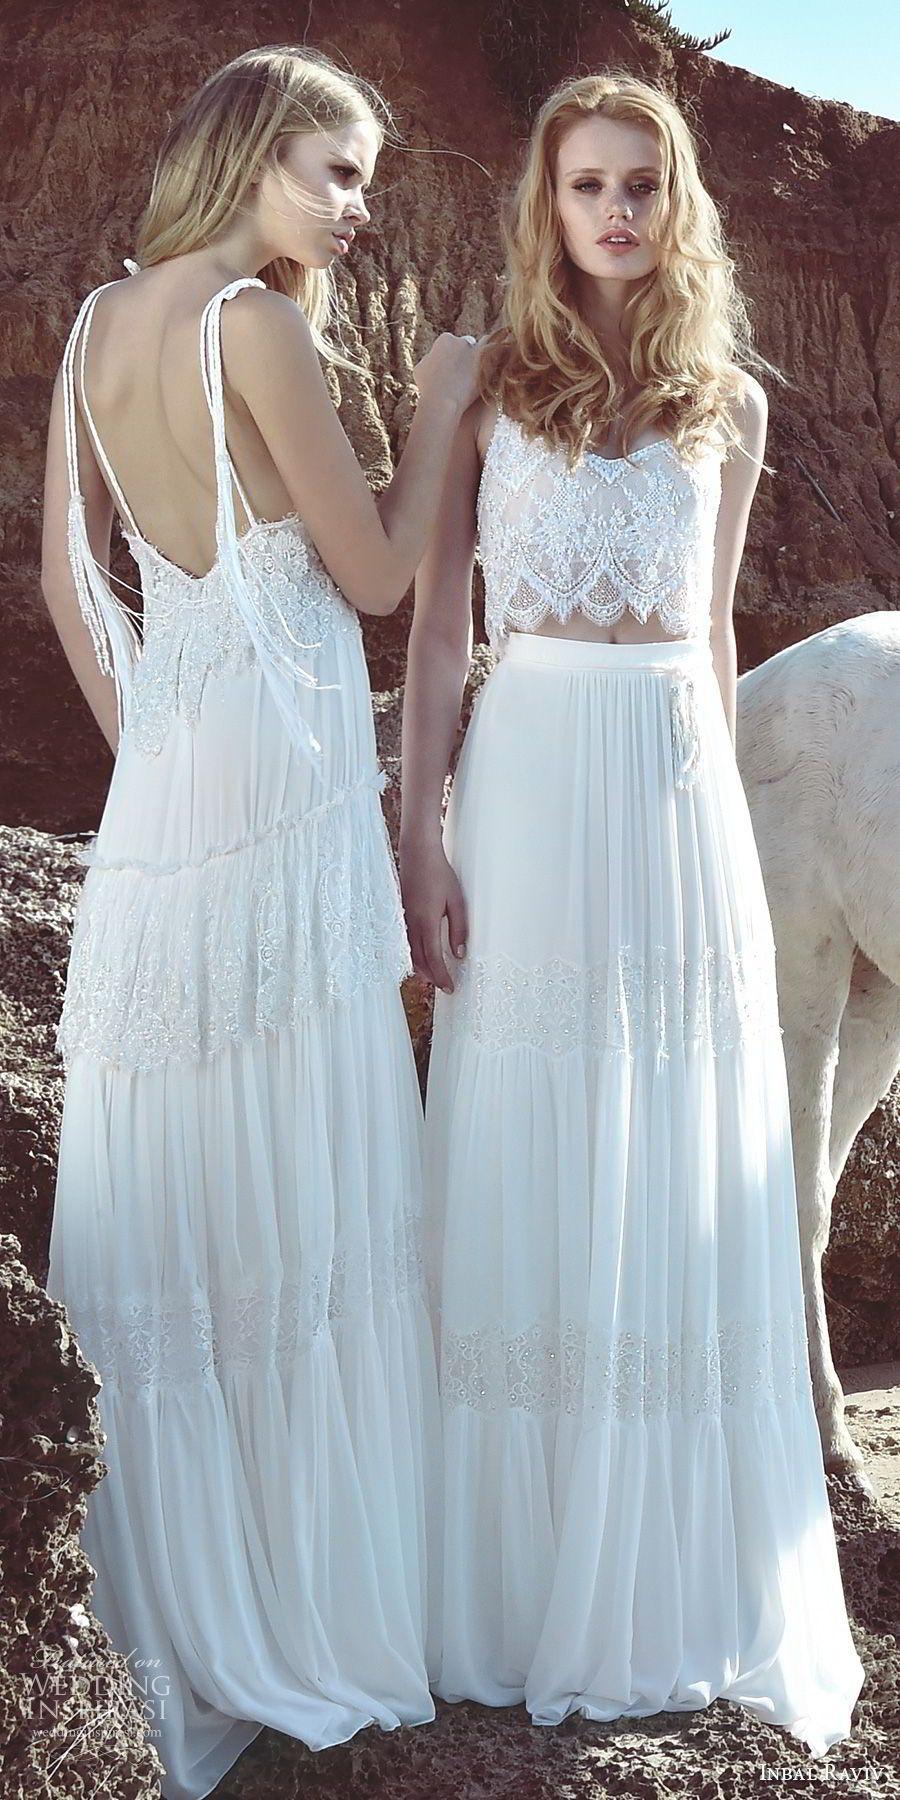 Inbal Raviv 2017 Wedding Dresses   Bodice, Neckline and Wedding dress